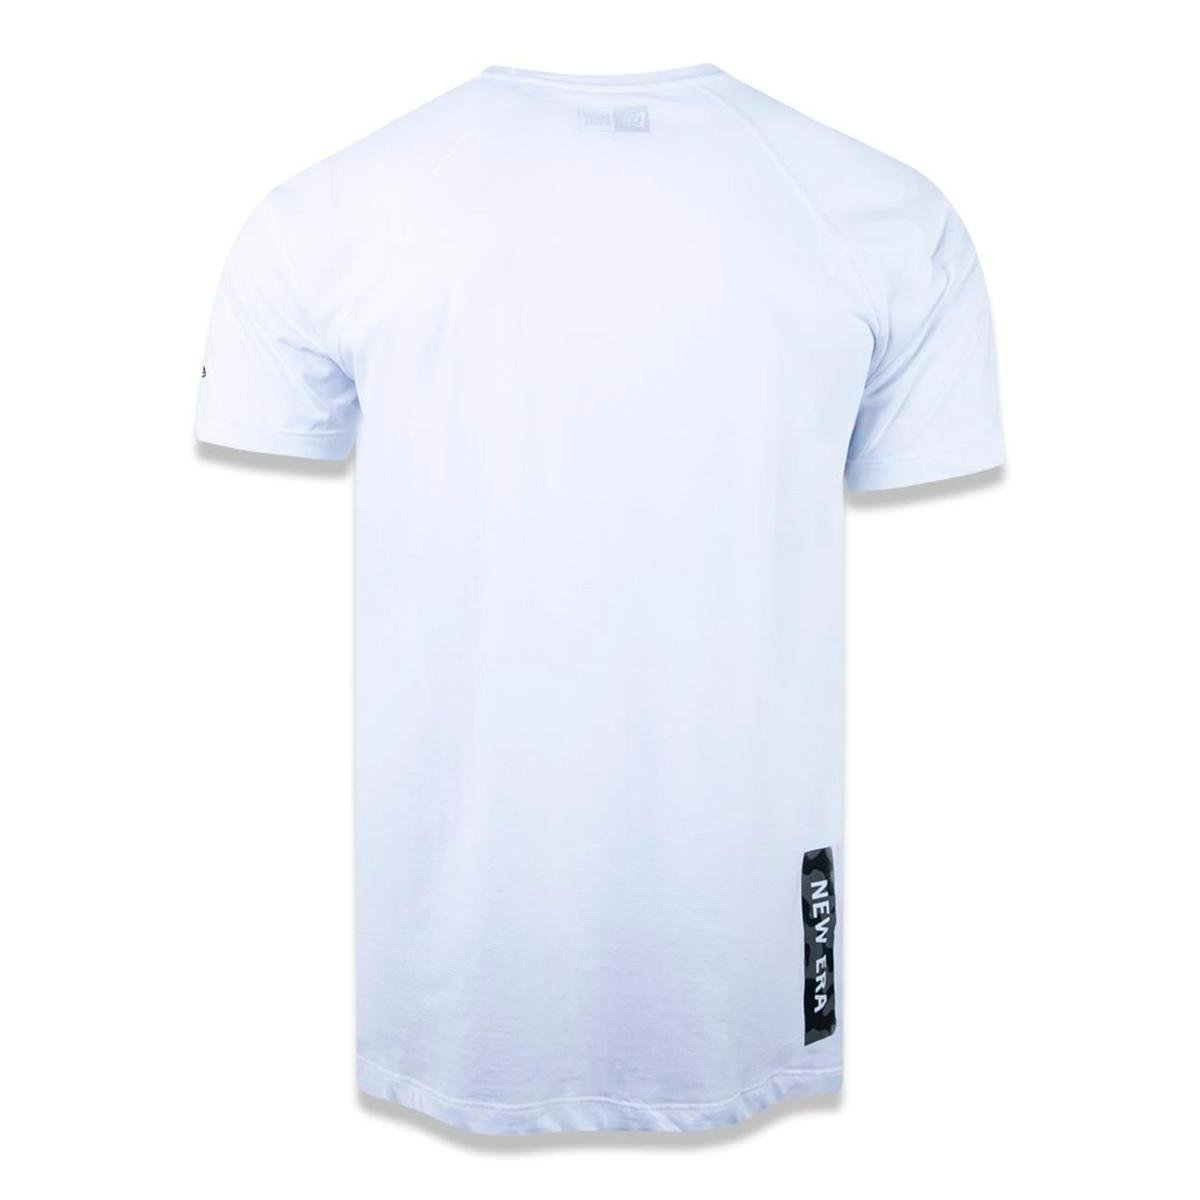 f4c2cd54a3bbe Camiseta Branded New Era Masculina  Camiseta Branded New Era Masculina ...